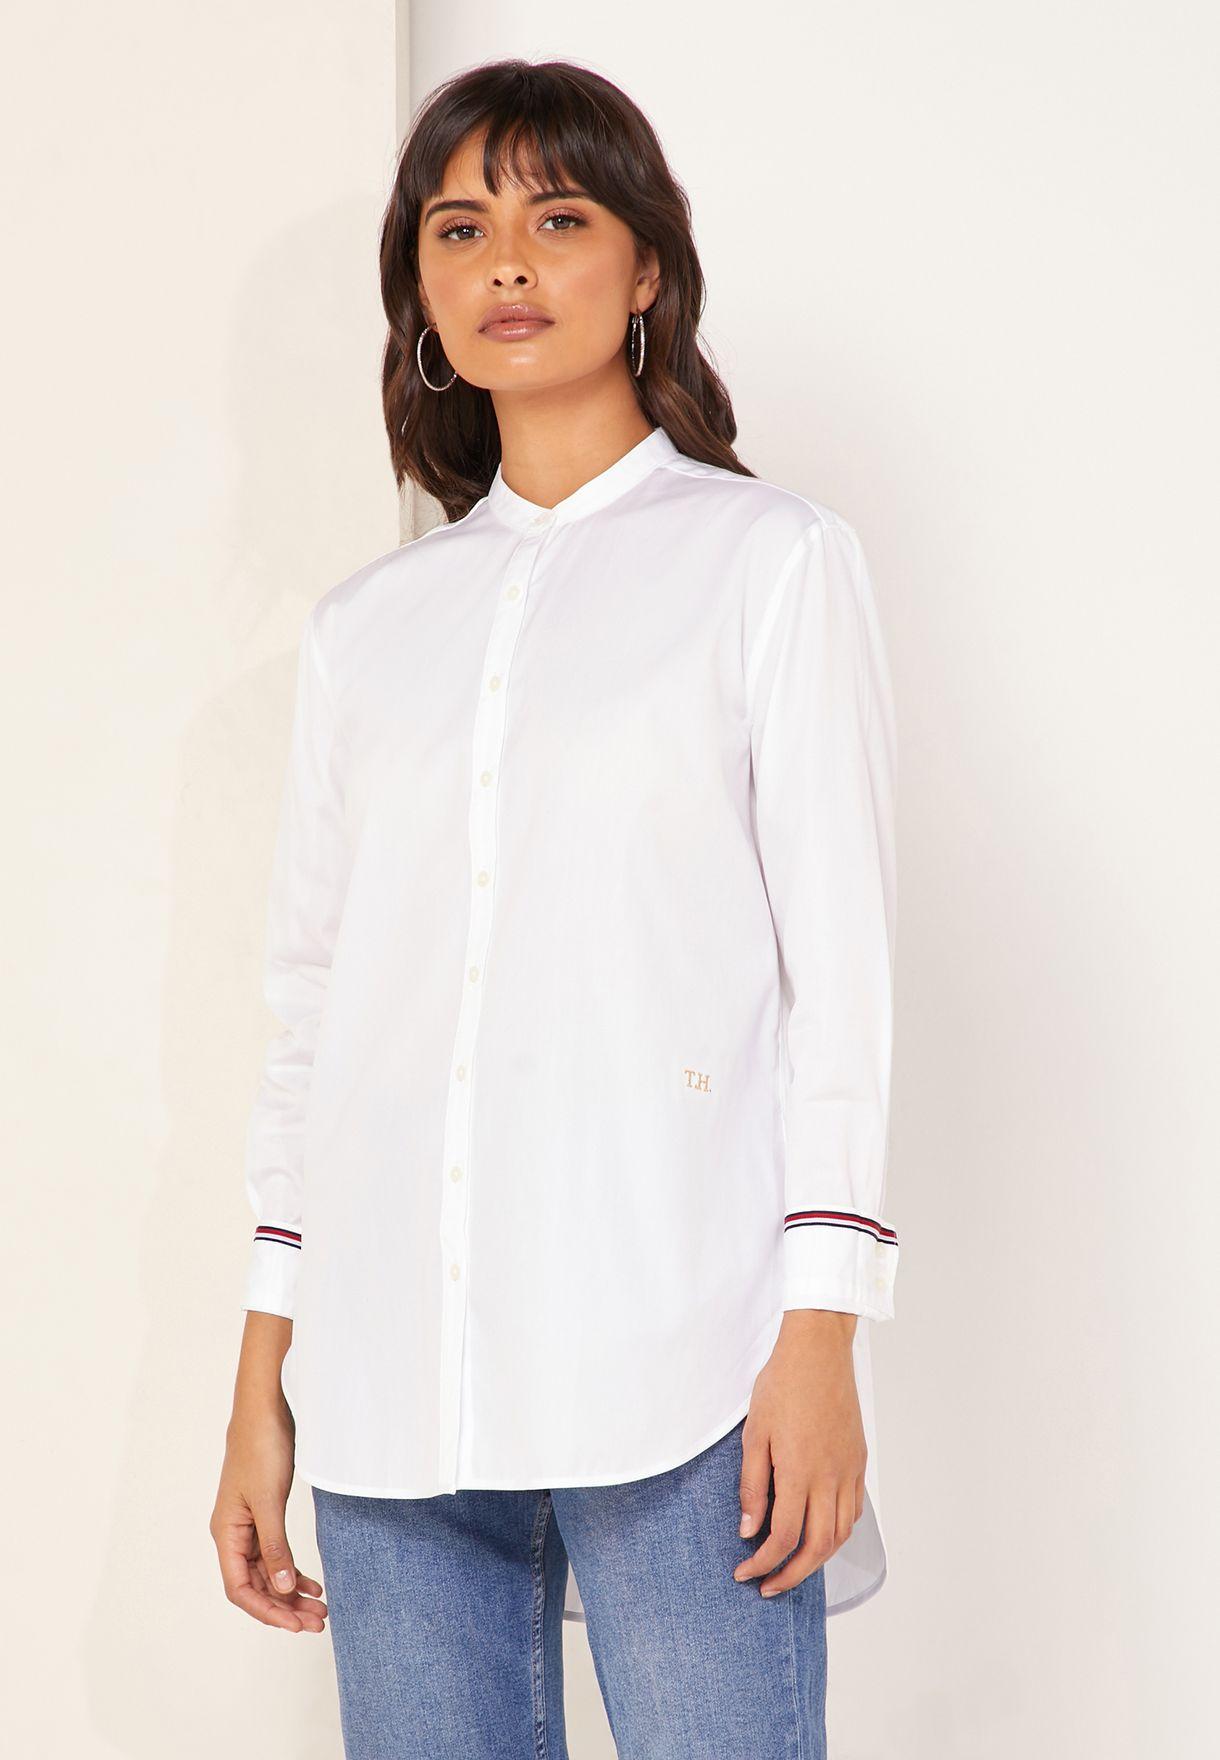 tommy hilfiger white shirt women